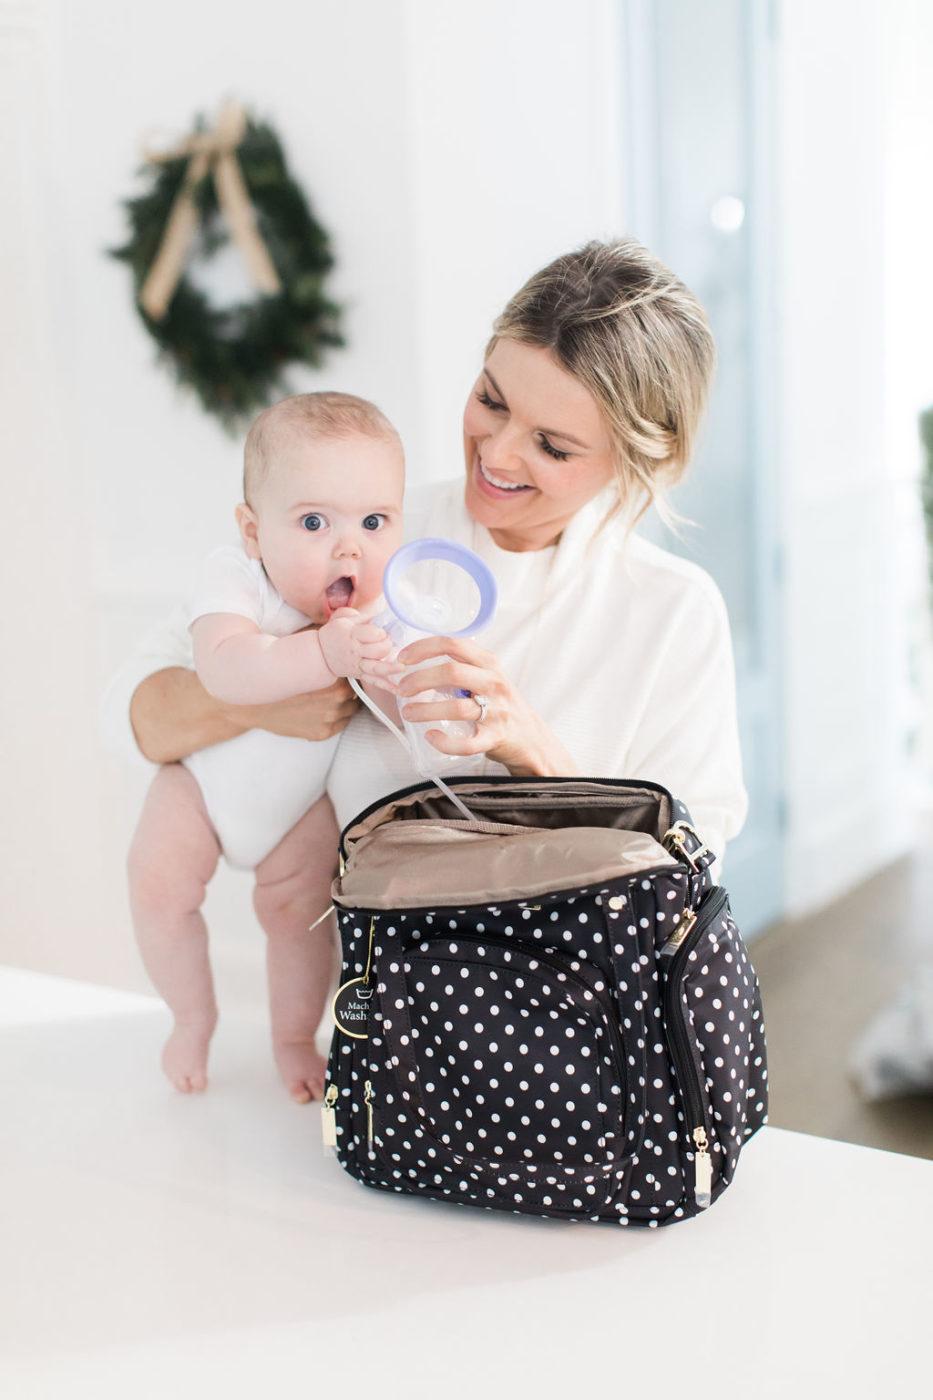 Getting a Free Breast Pump Through Insurance